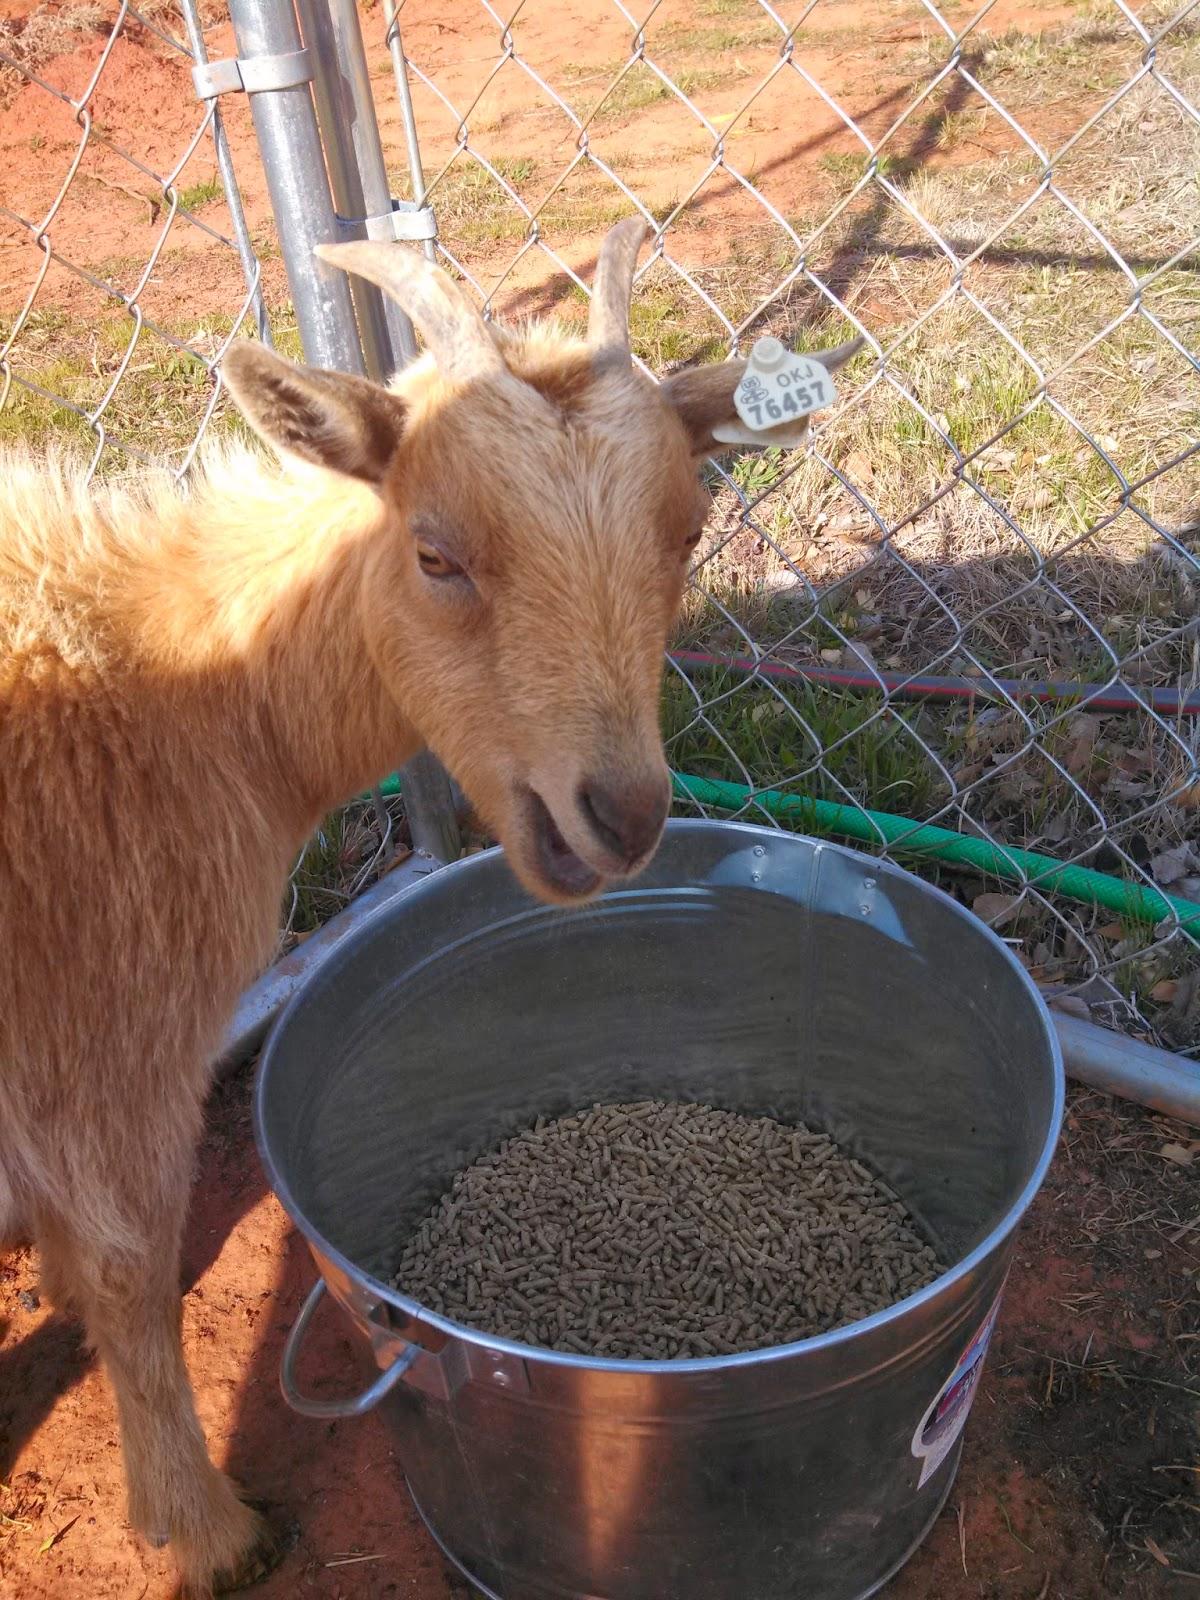 Goats, pygmy goats, dwarf goats